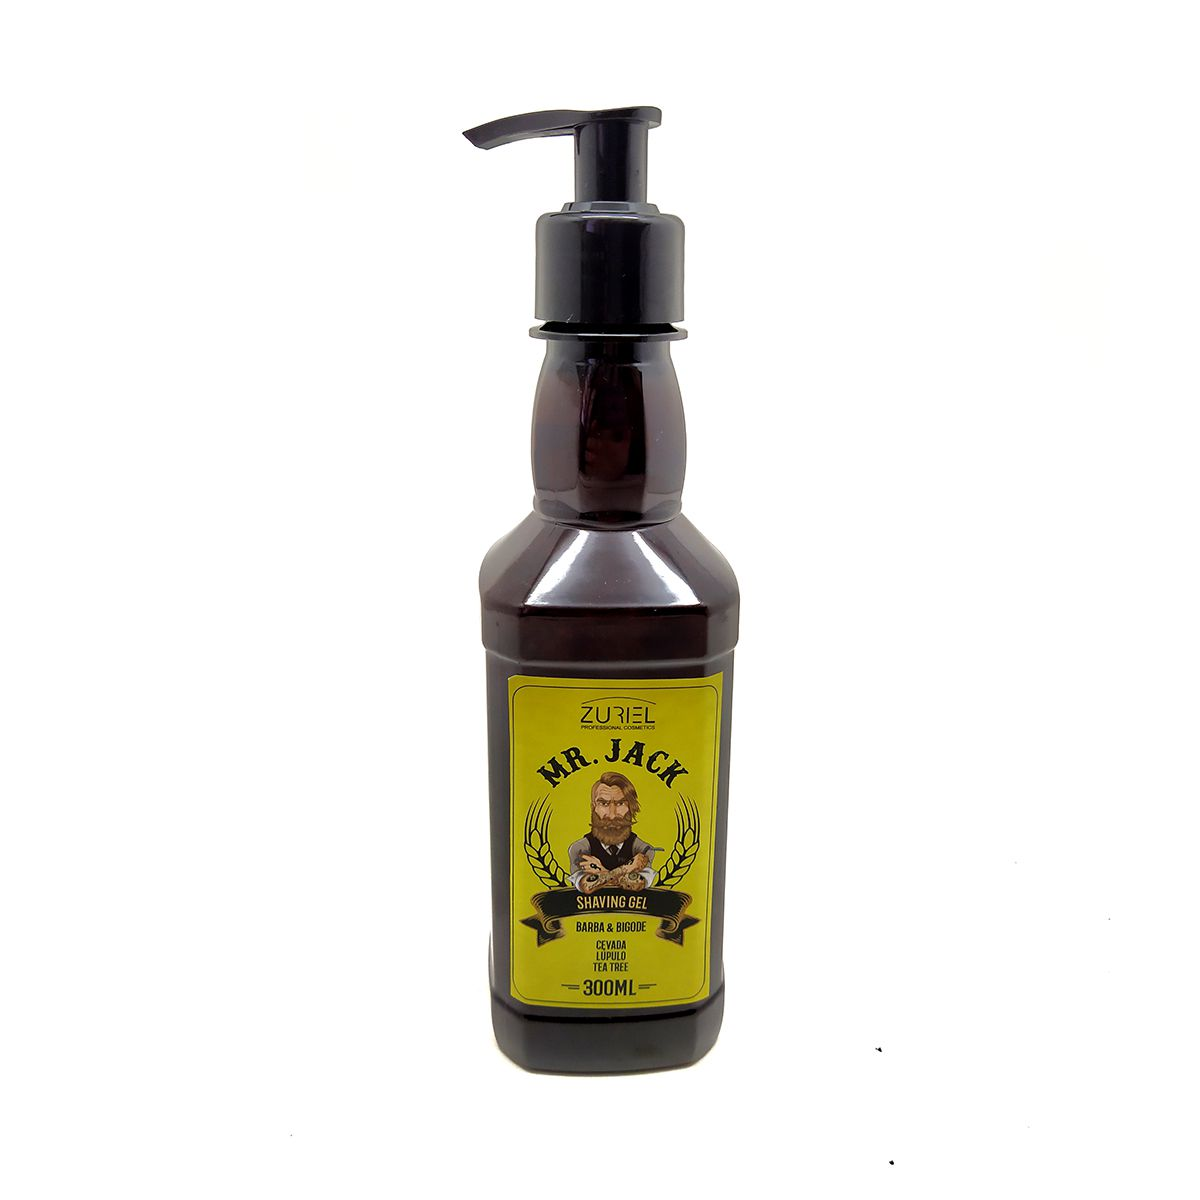 Gel de Barbear Shaving Pure Malt Mr jack - 300ml